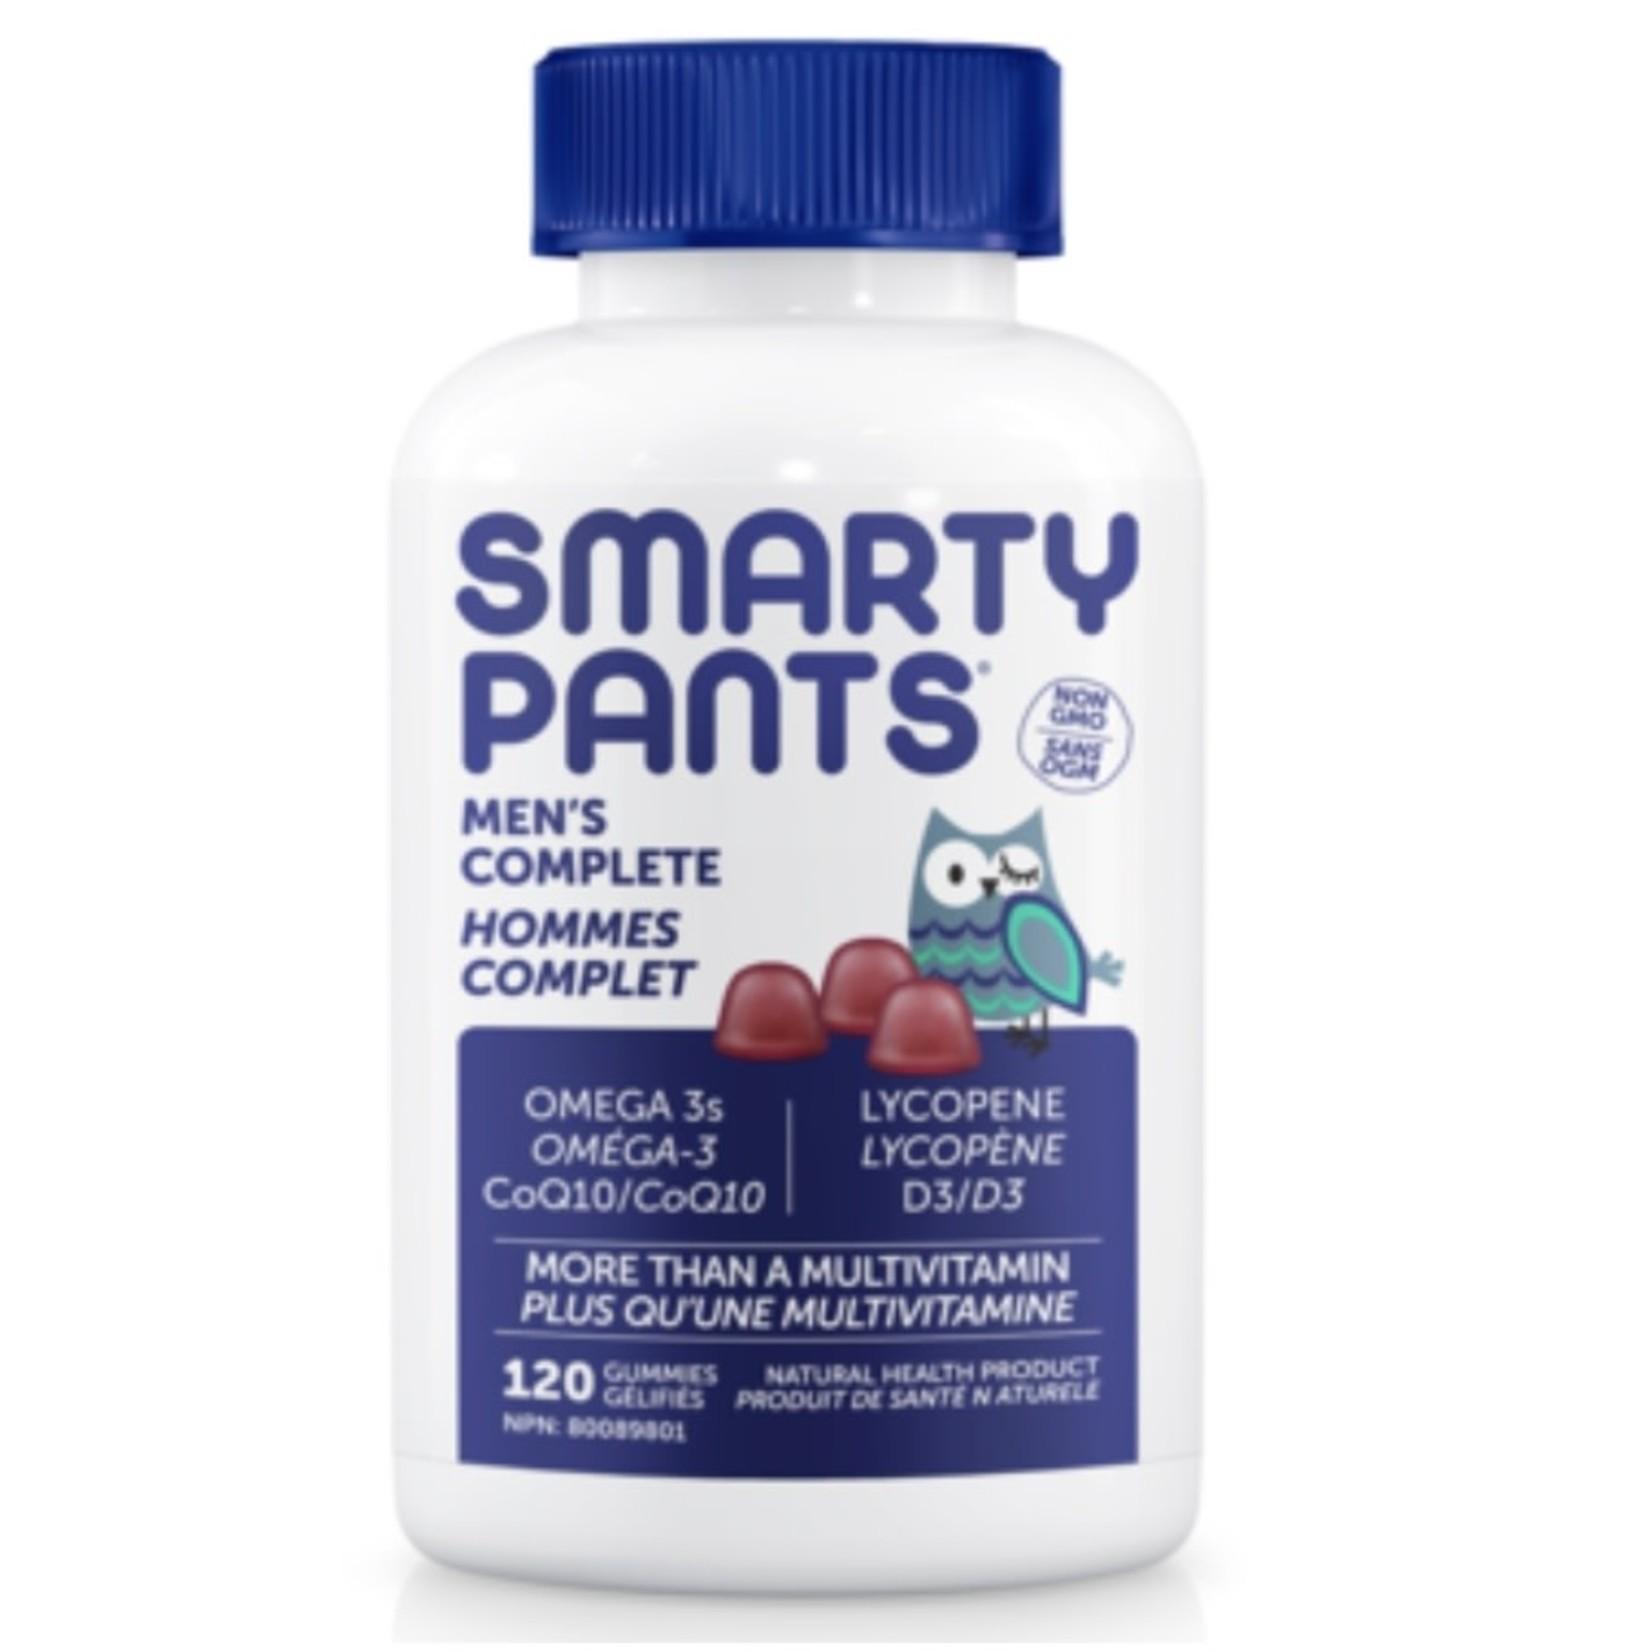 Smarty Pants Smarty Pants Men's Complete 120 gummies